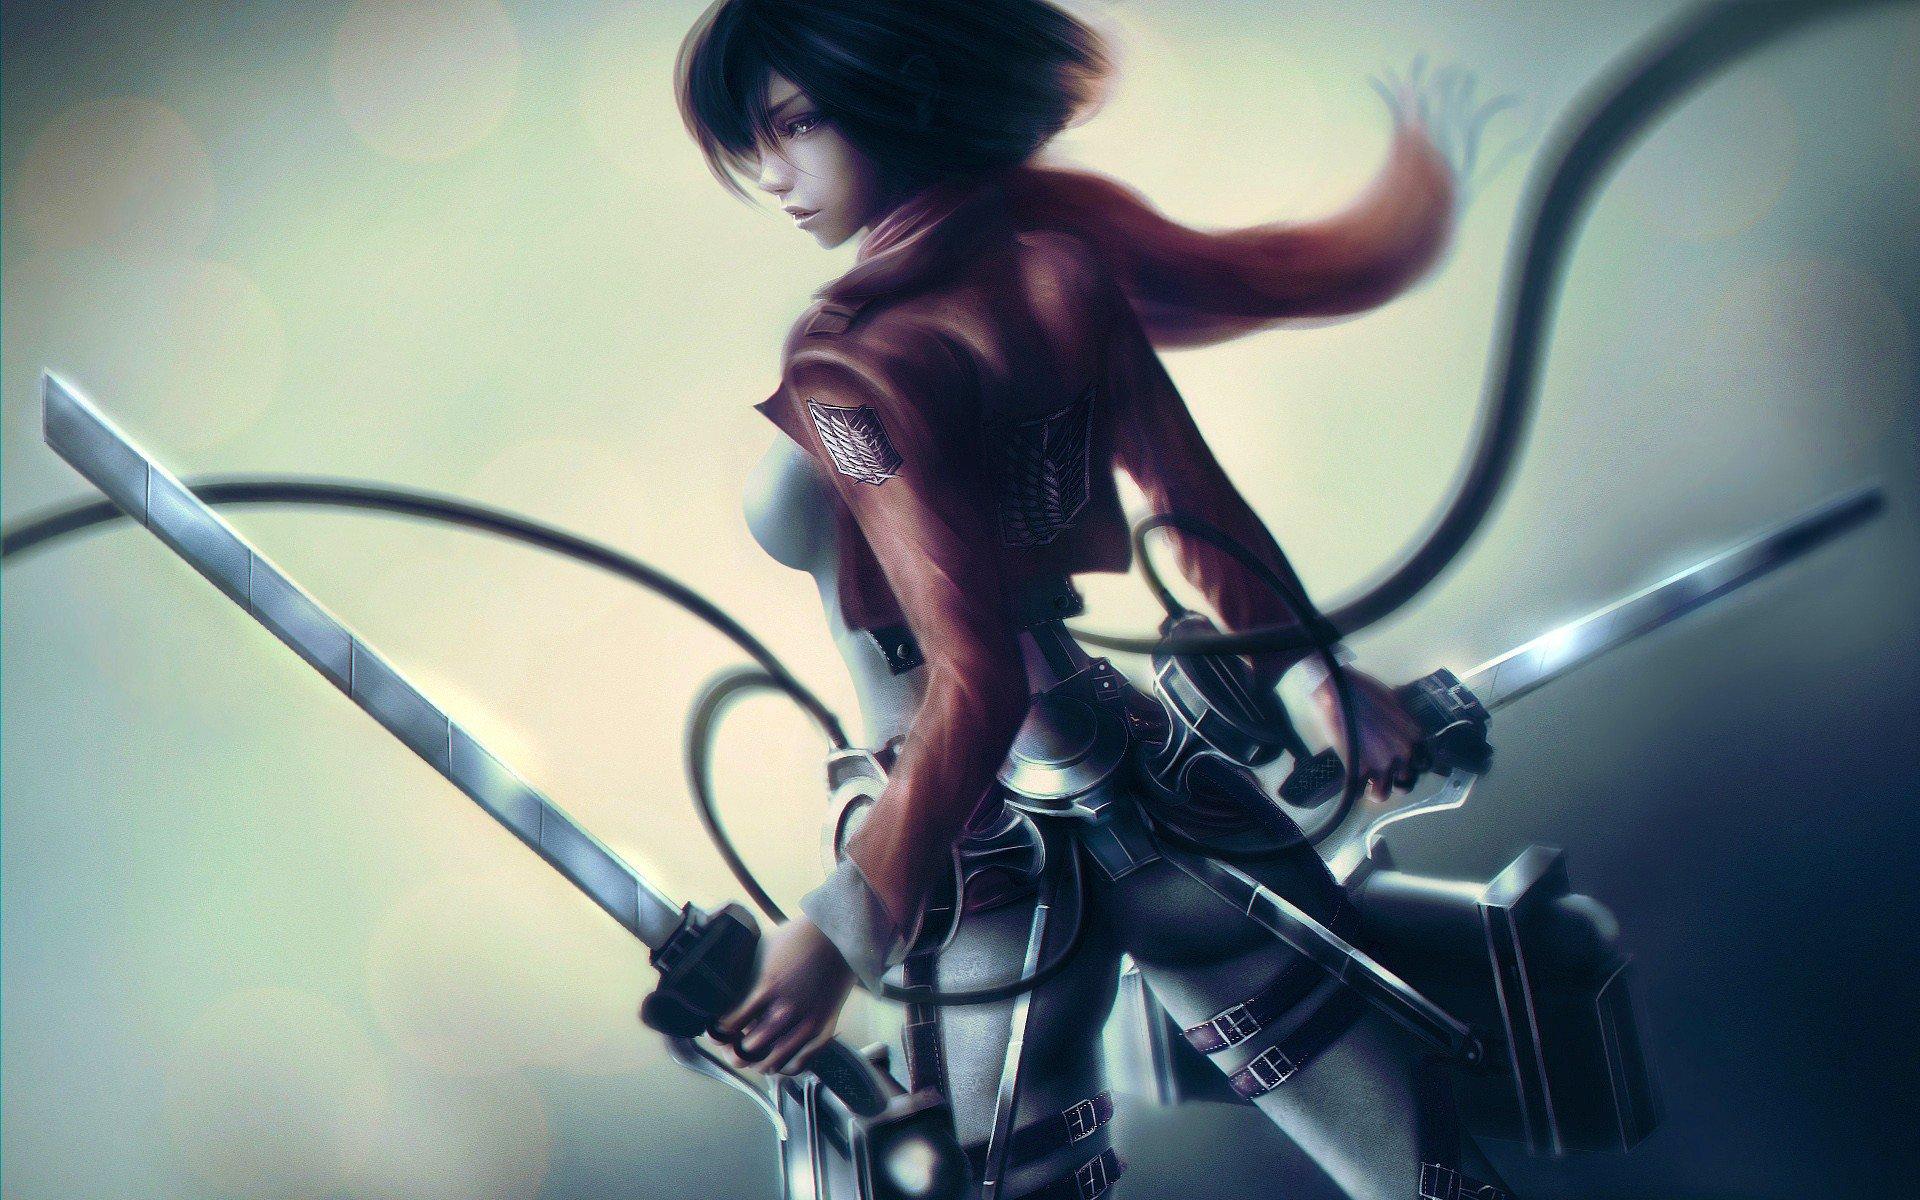 protagonist anime girl hd anime 4k wallpapers images